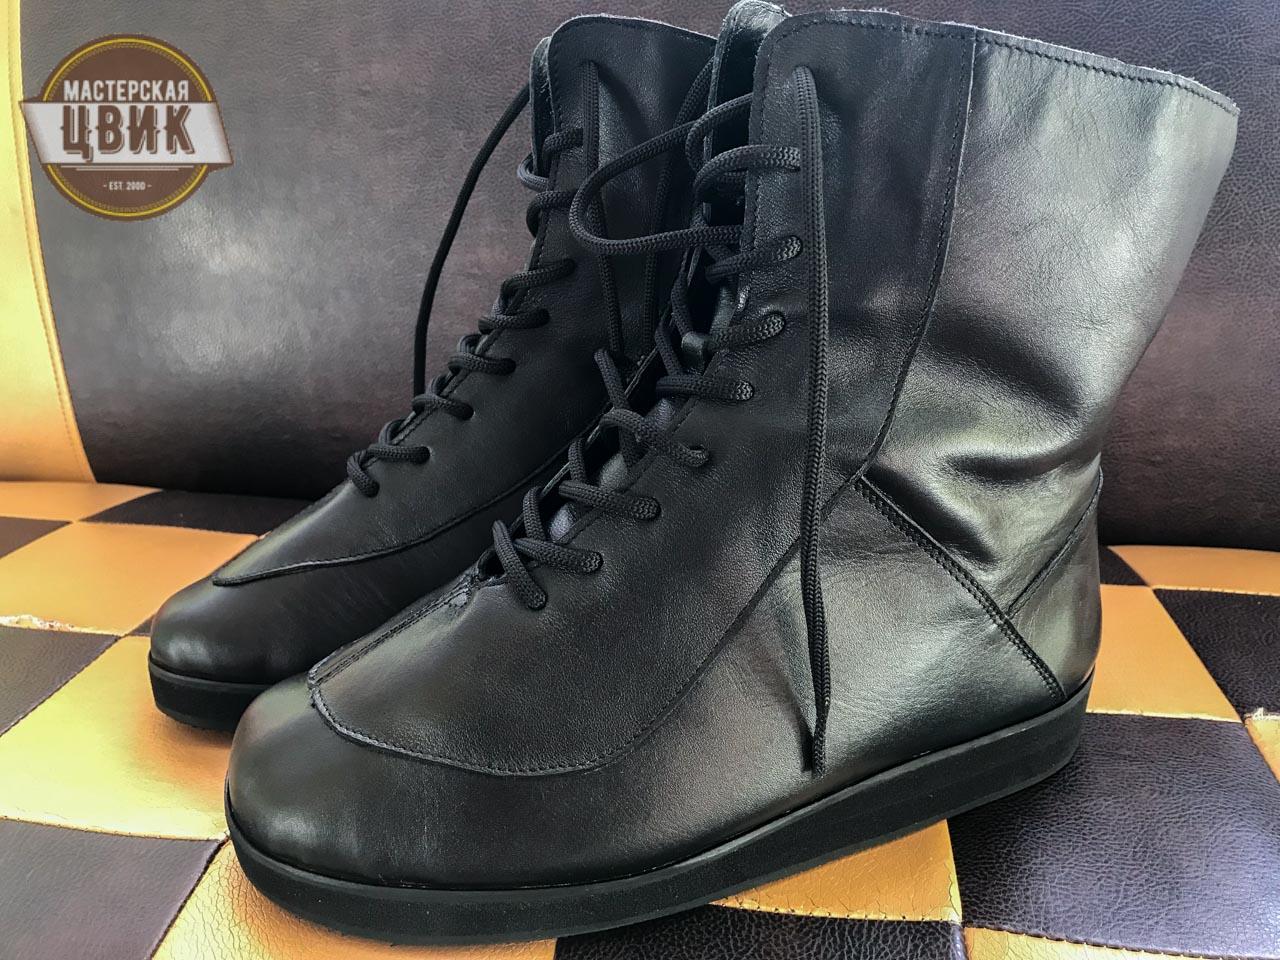 individualnyj-poshiv-obuvi-minsk-4 Индивидуальный пошив обуви